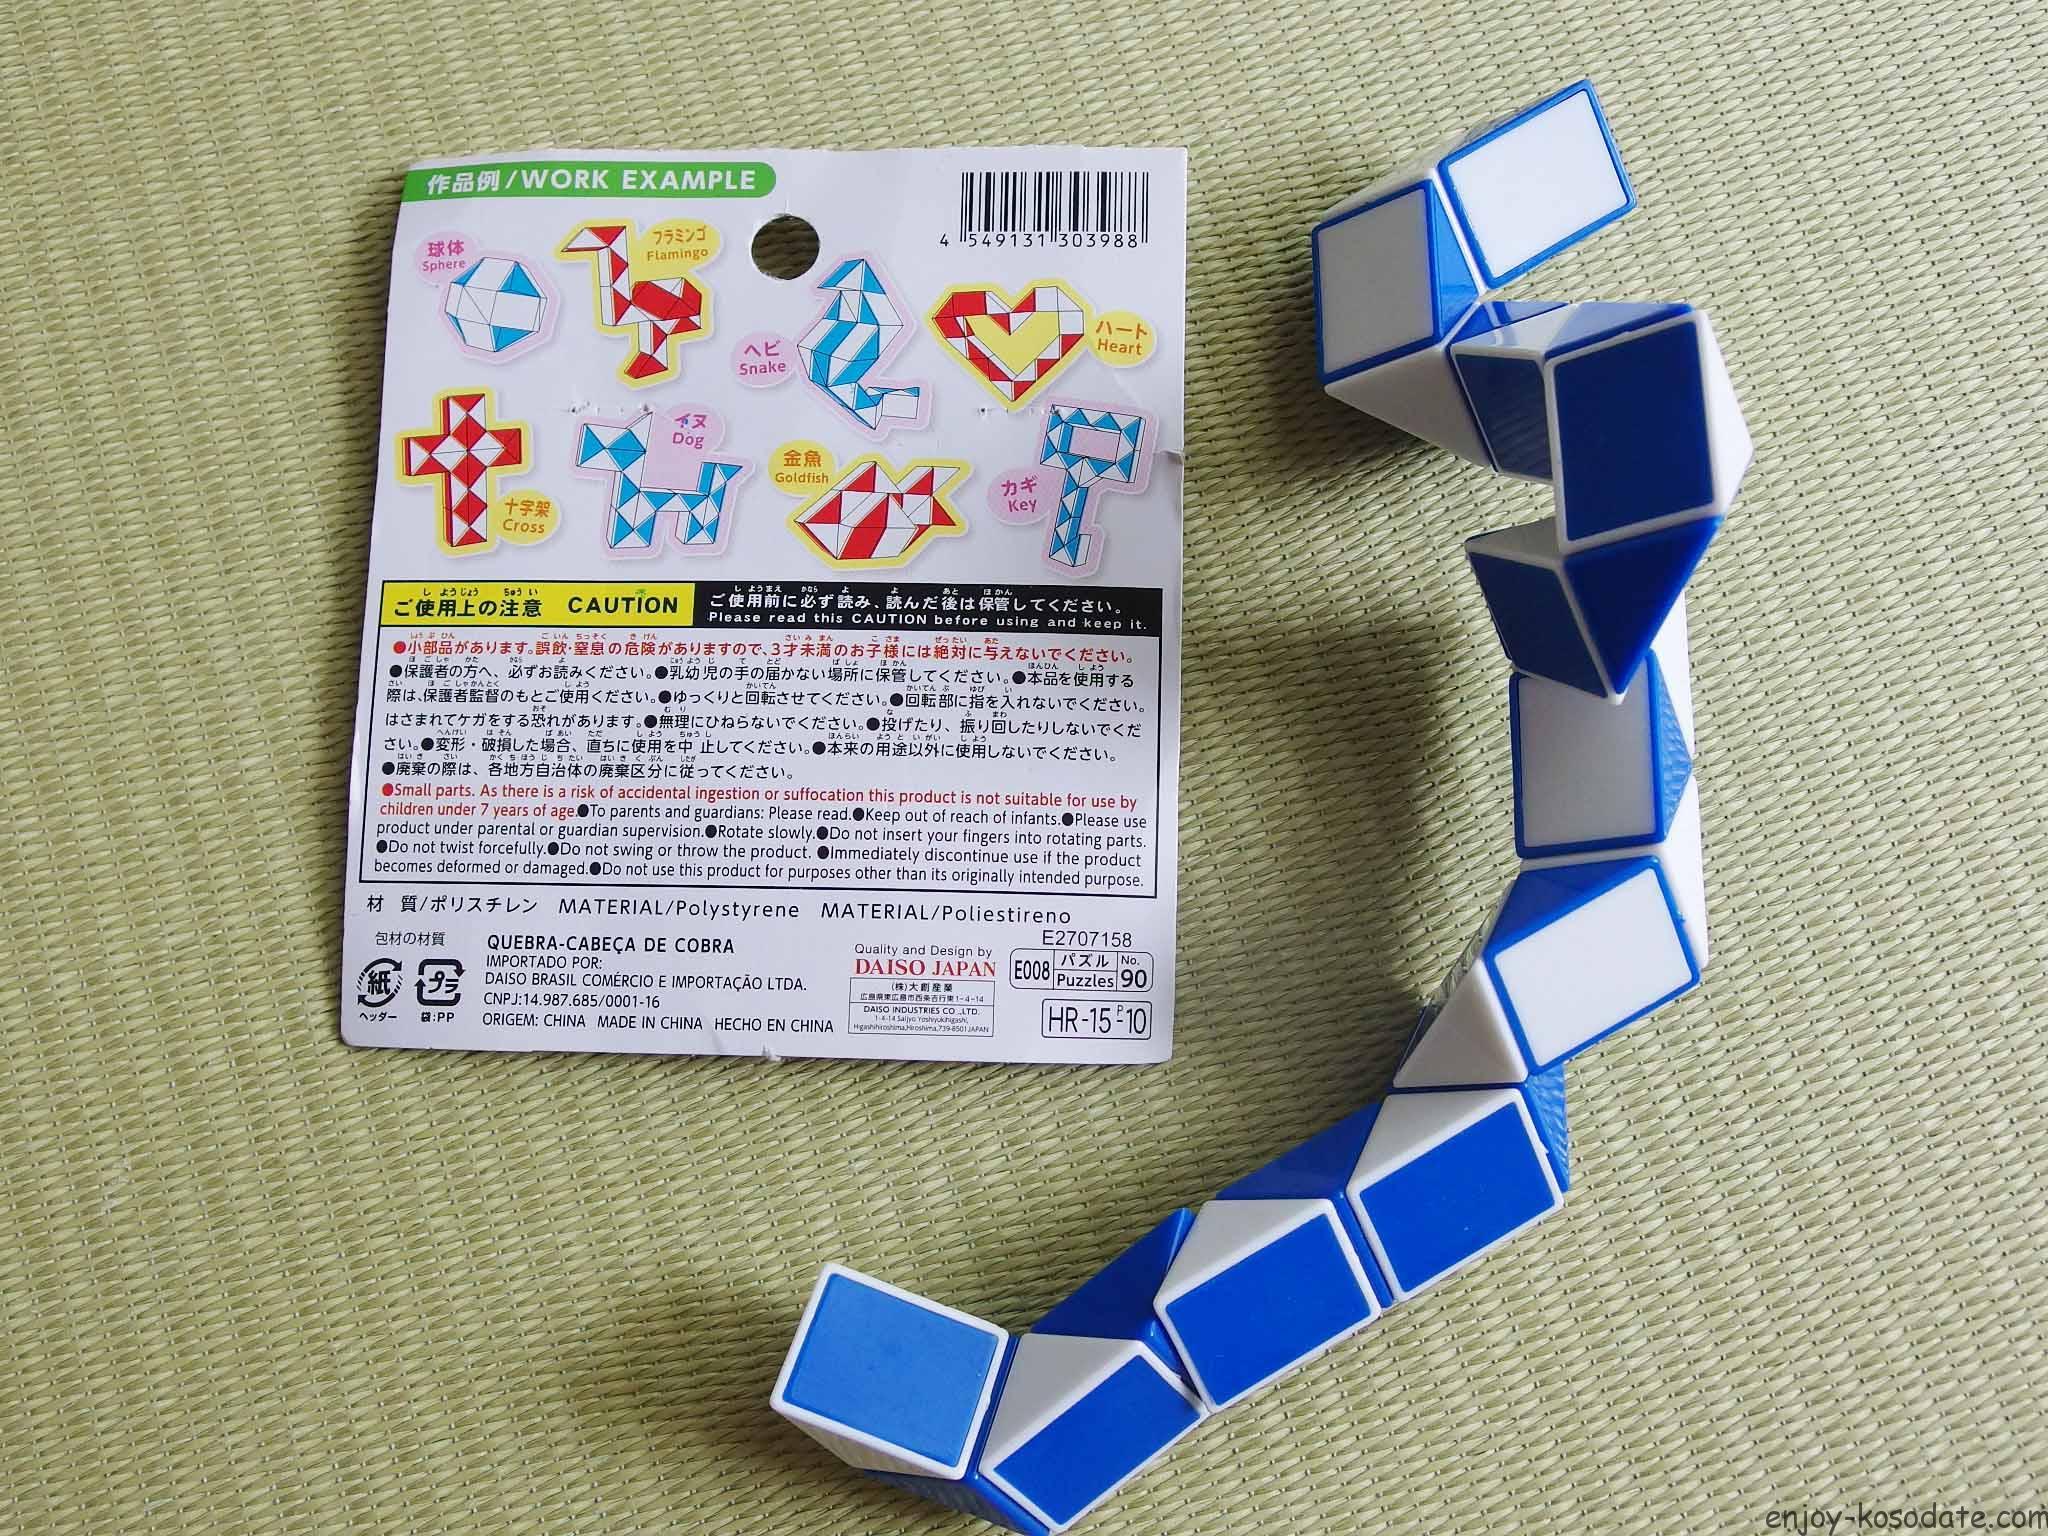 IMGP0275 - コピー